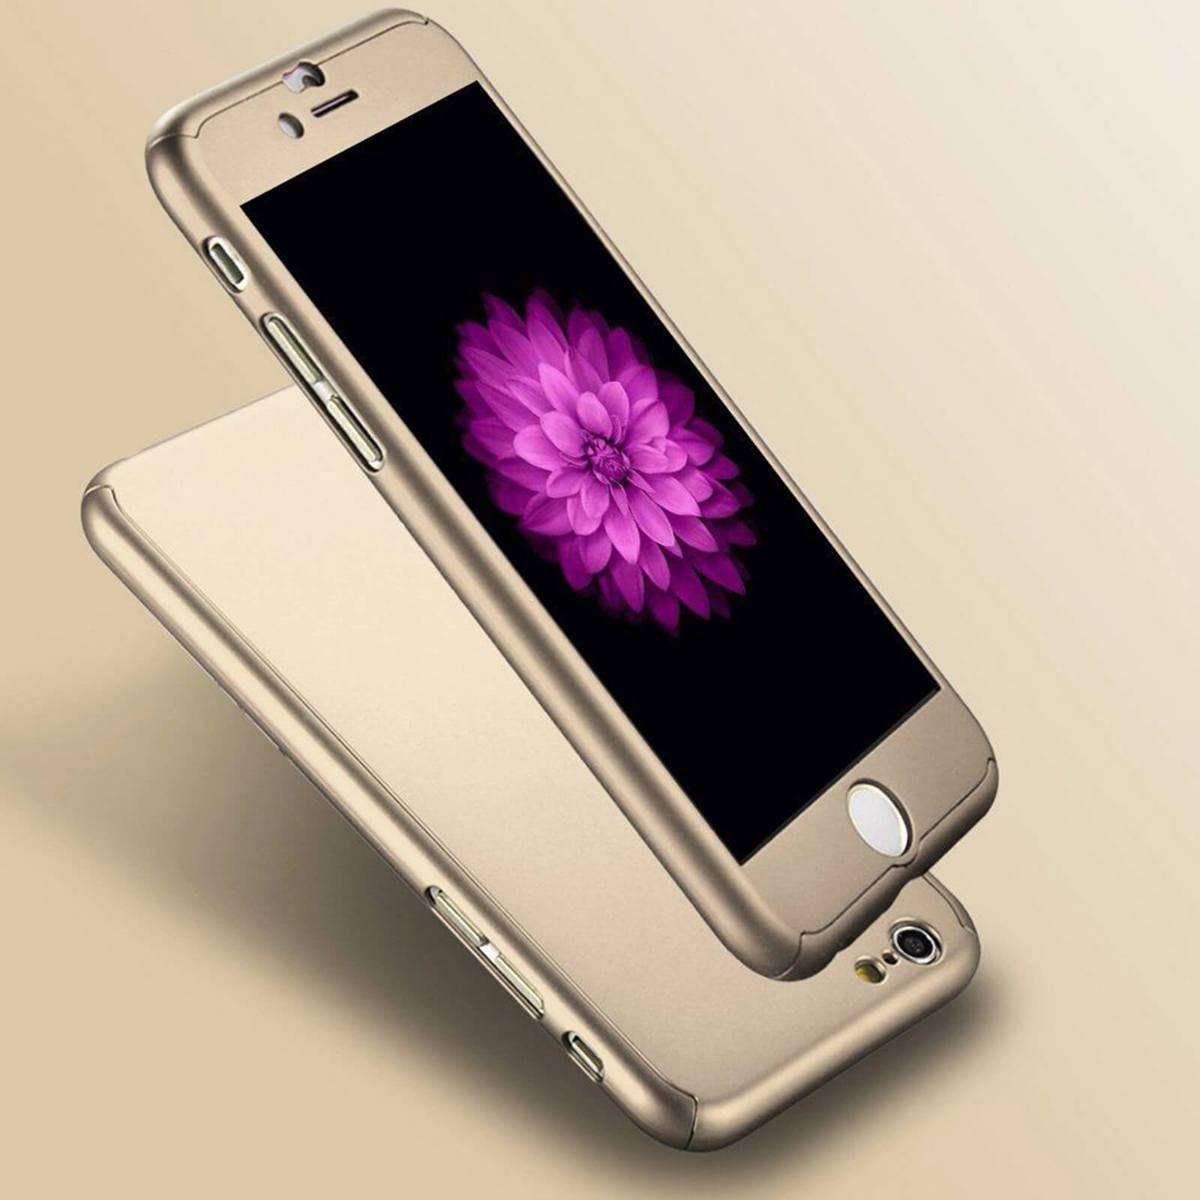 For-Apple-iPhone-XS-Max-XR-Hybrid-360-Slim-Ultra-Thin-Heavy-Duty-Shockproof-Case Indexbild 66